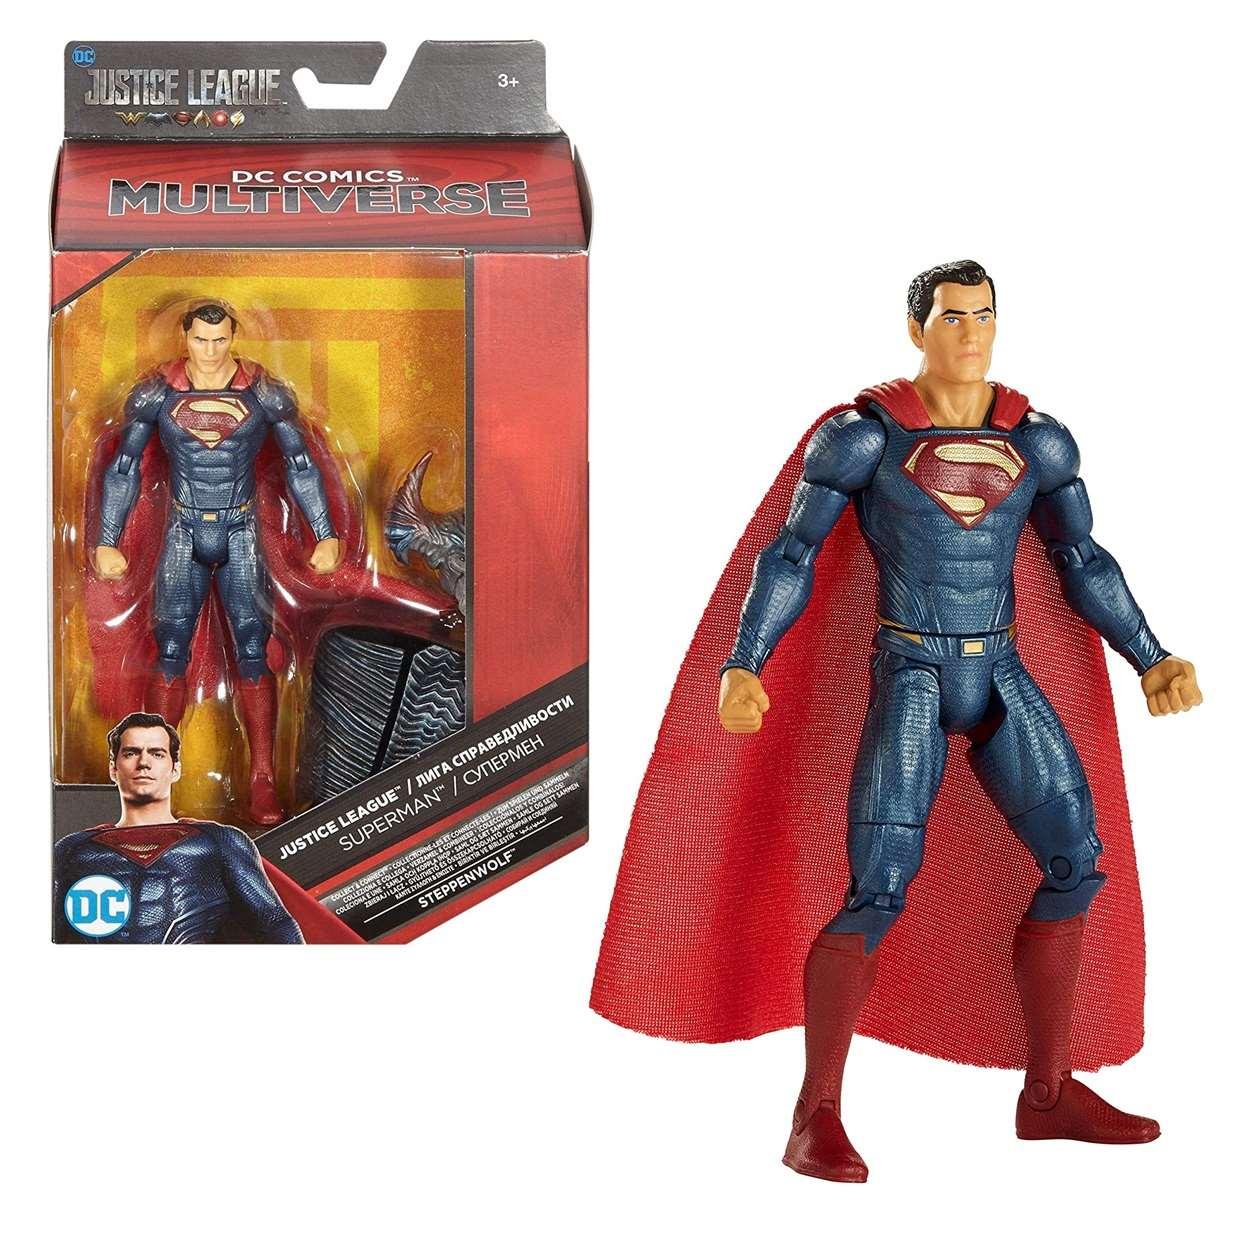 Superman Figura Justice League Steppenwolf Multiverse 6 PuLG